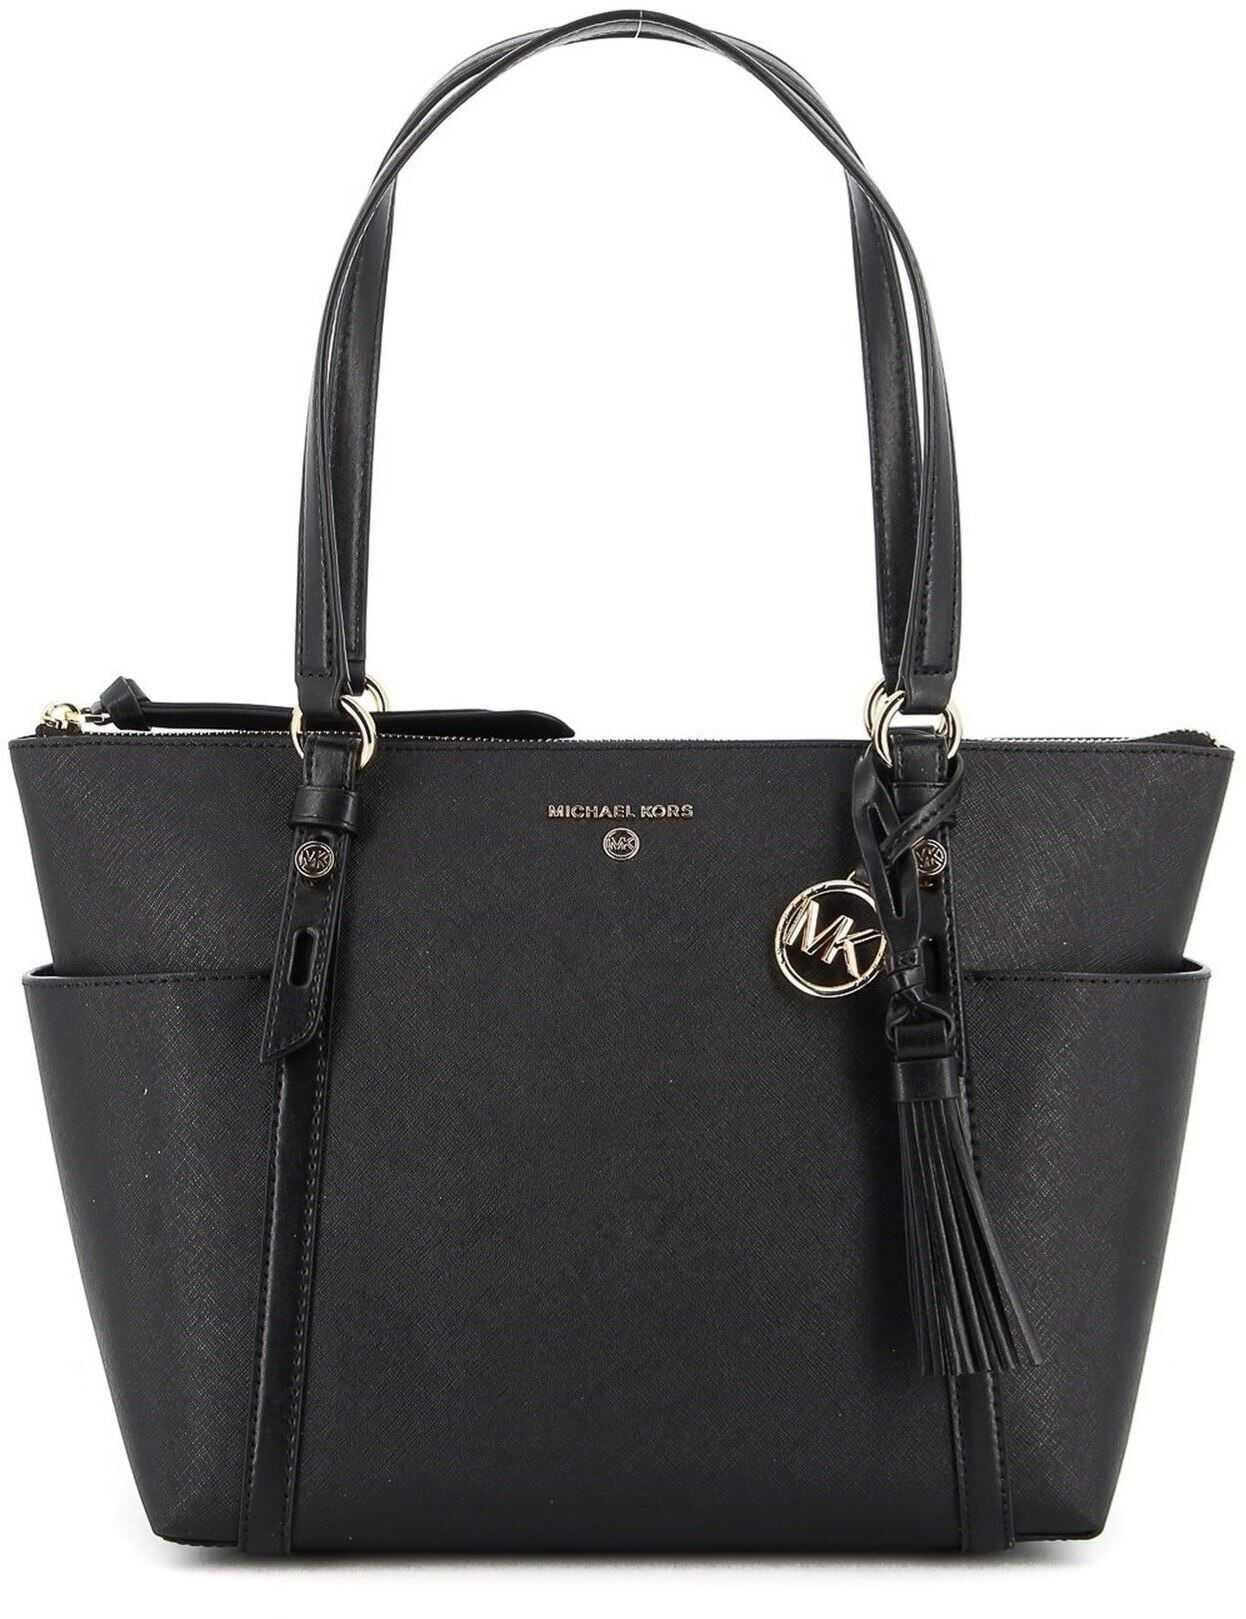 Michael Kors Nomad Medium Tote Bag In Black 30T0GNXT2L BLACK Black imagine b-mall.ro